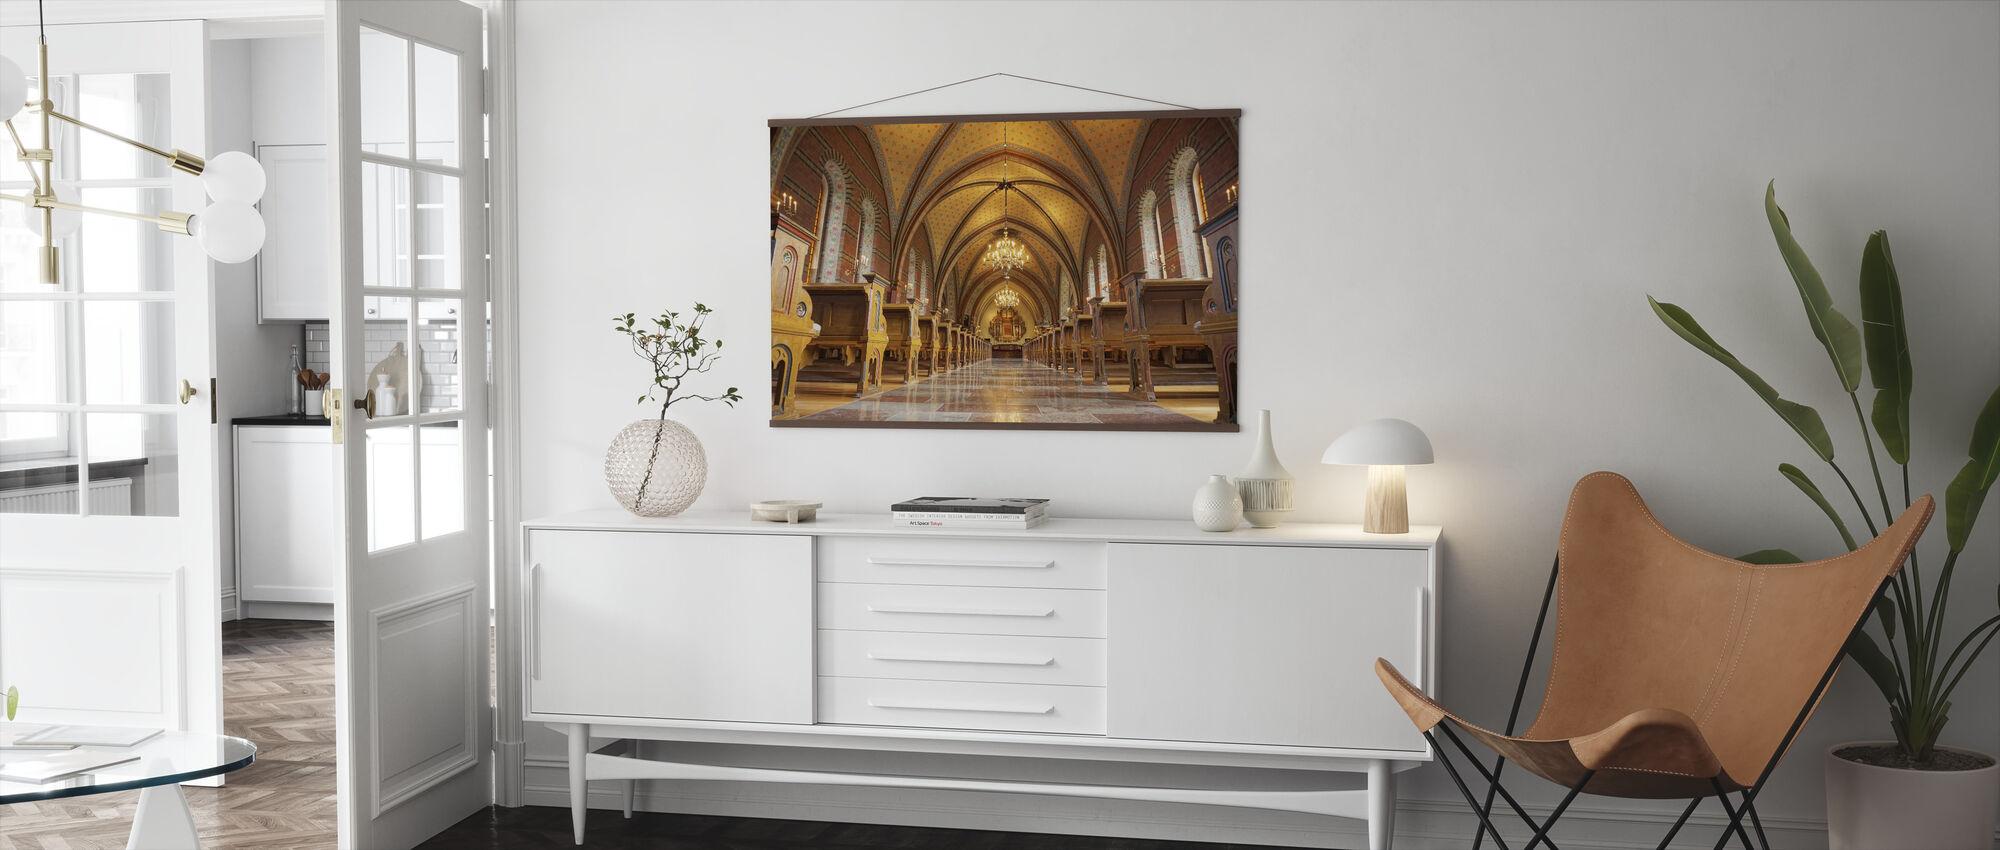 Katolsk kirke - Plakat - Stue